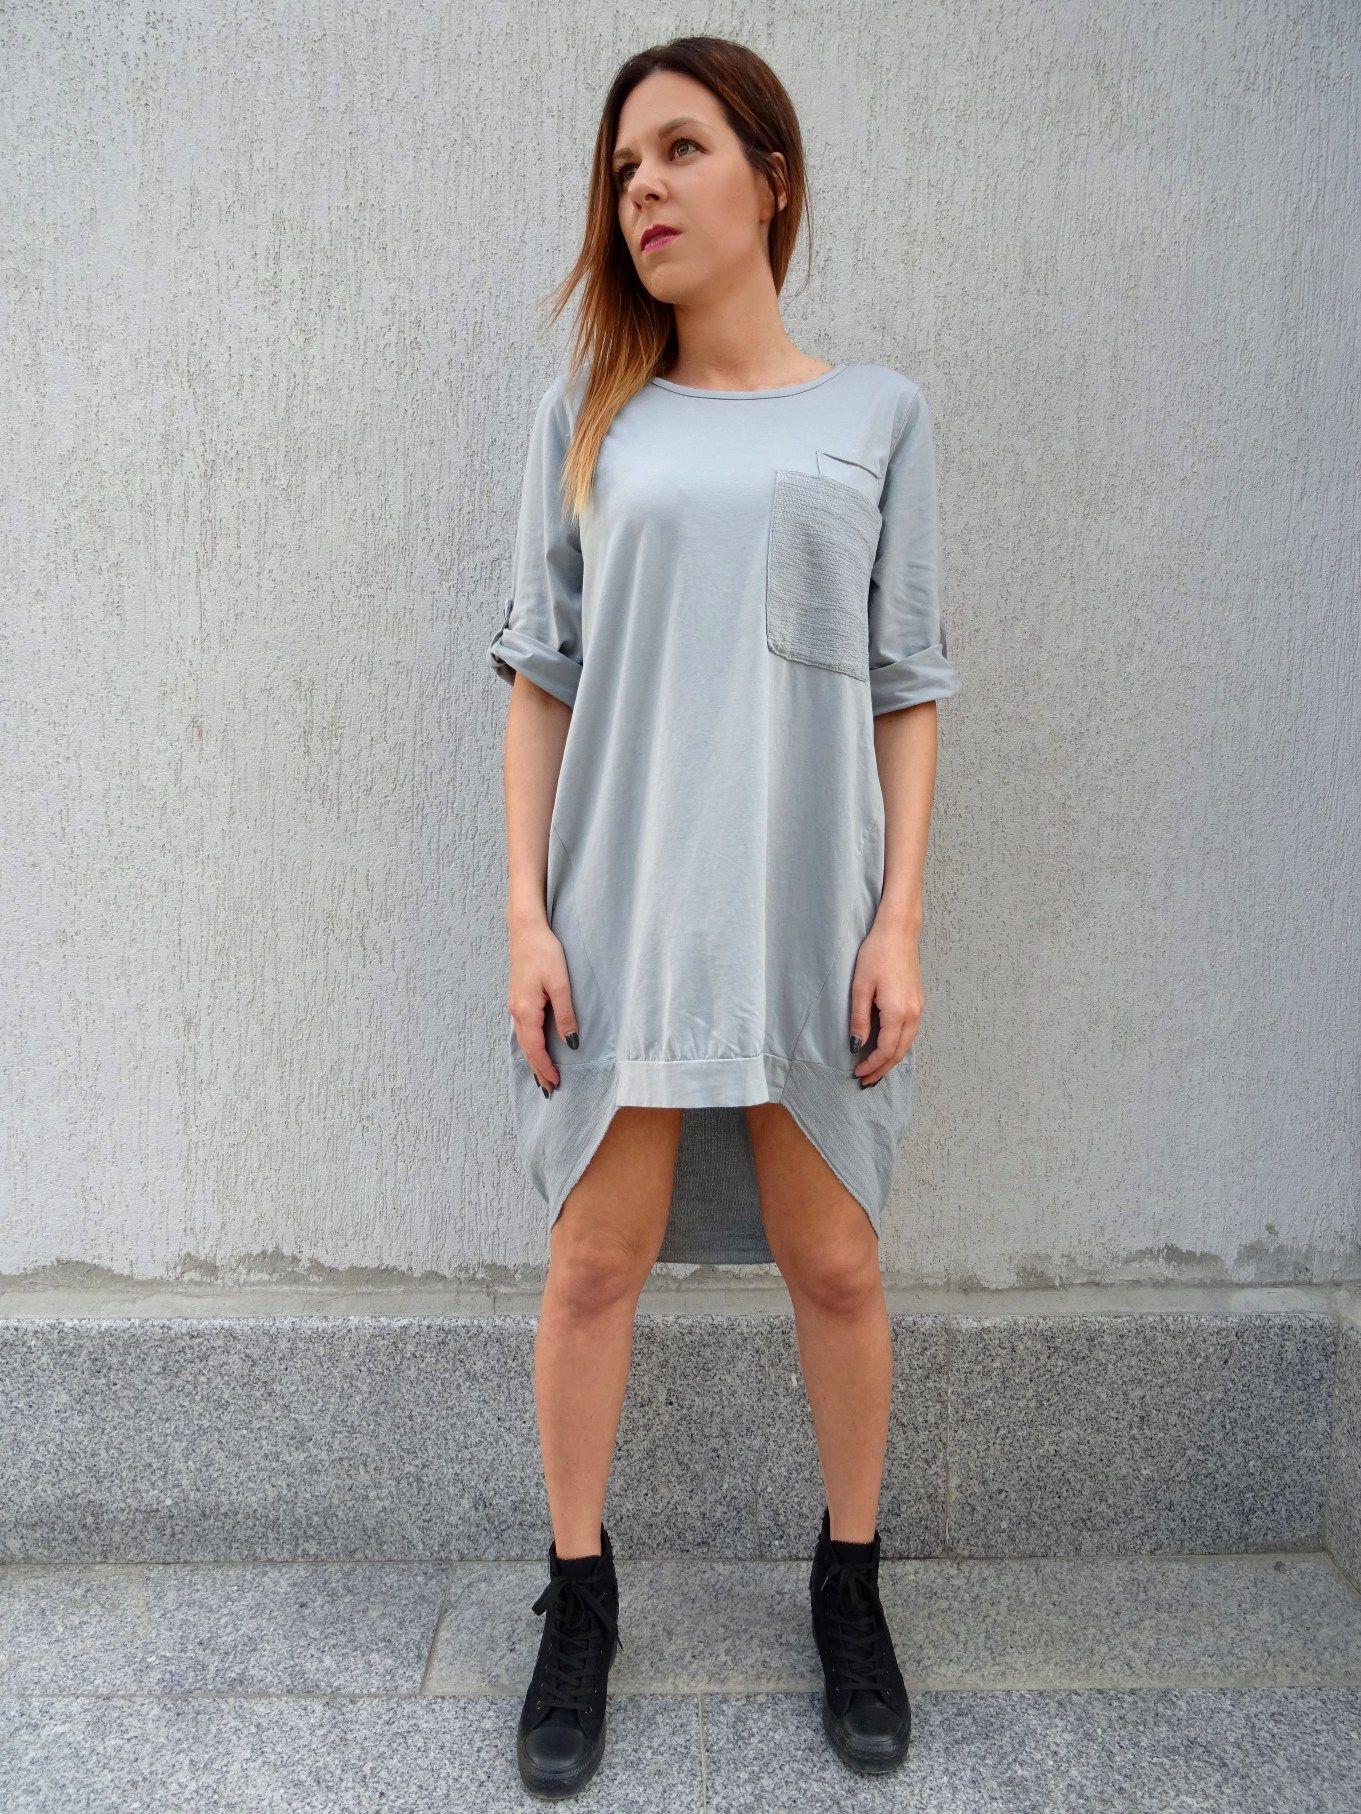 Oversize dresstunic dresswomens dressplus size dresscotton dress